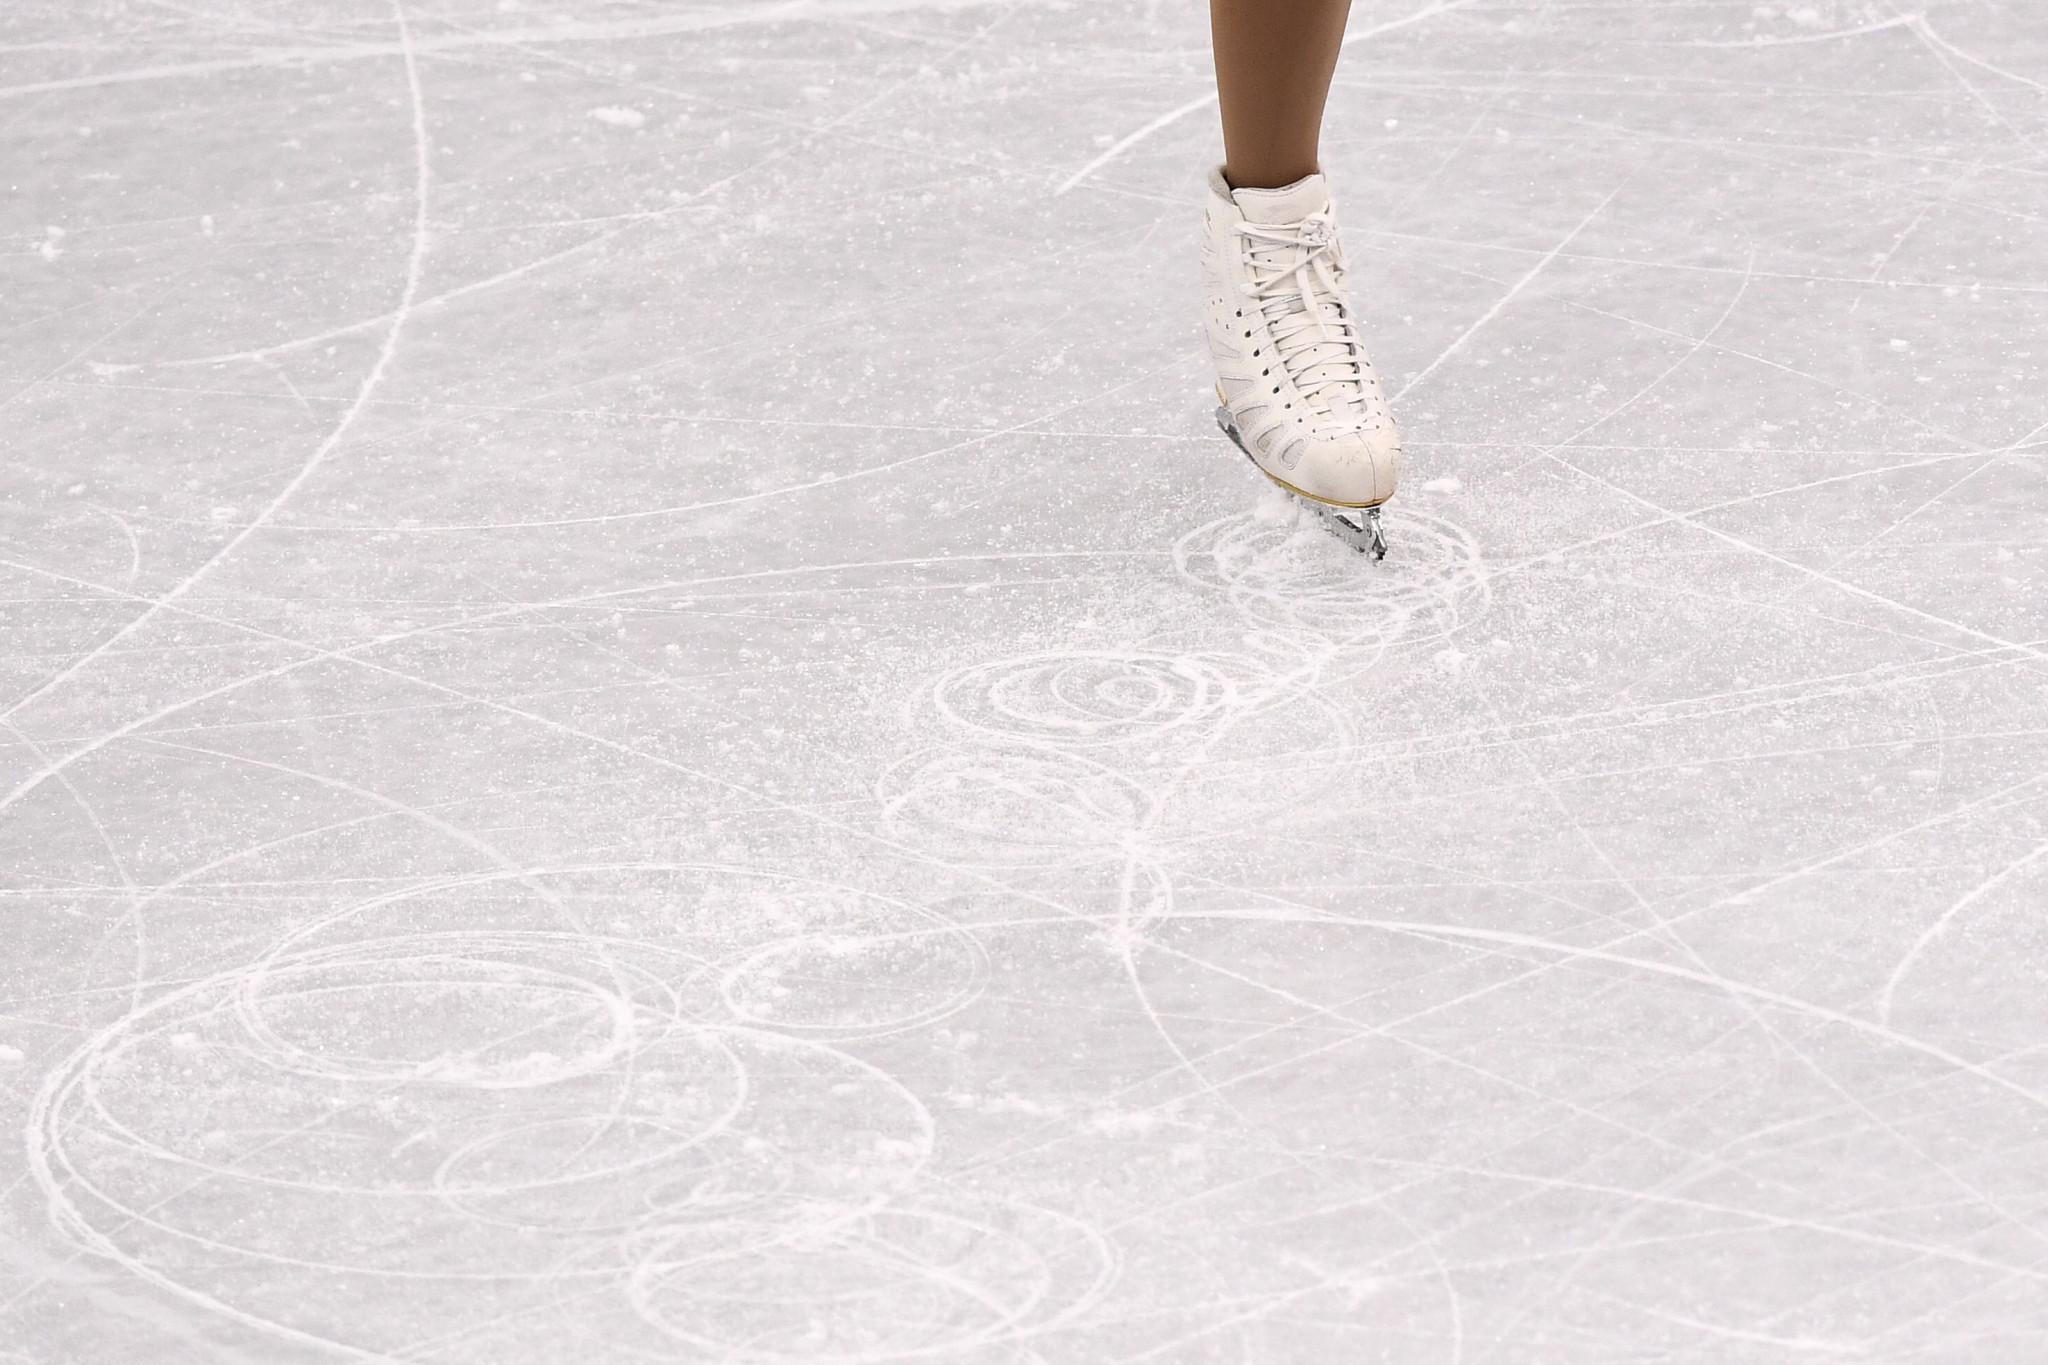 Skate Canada update National Safe Sport Program after accusations of ignoring complaints